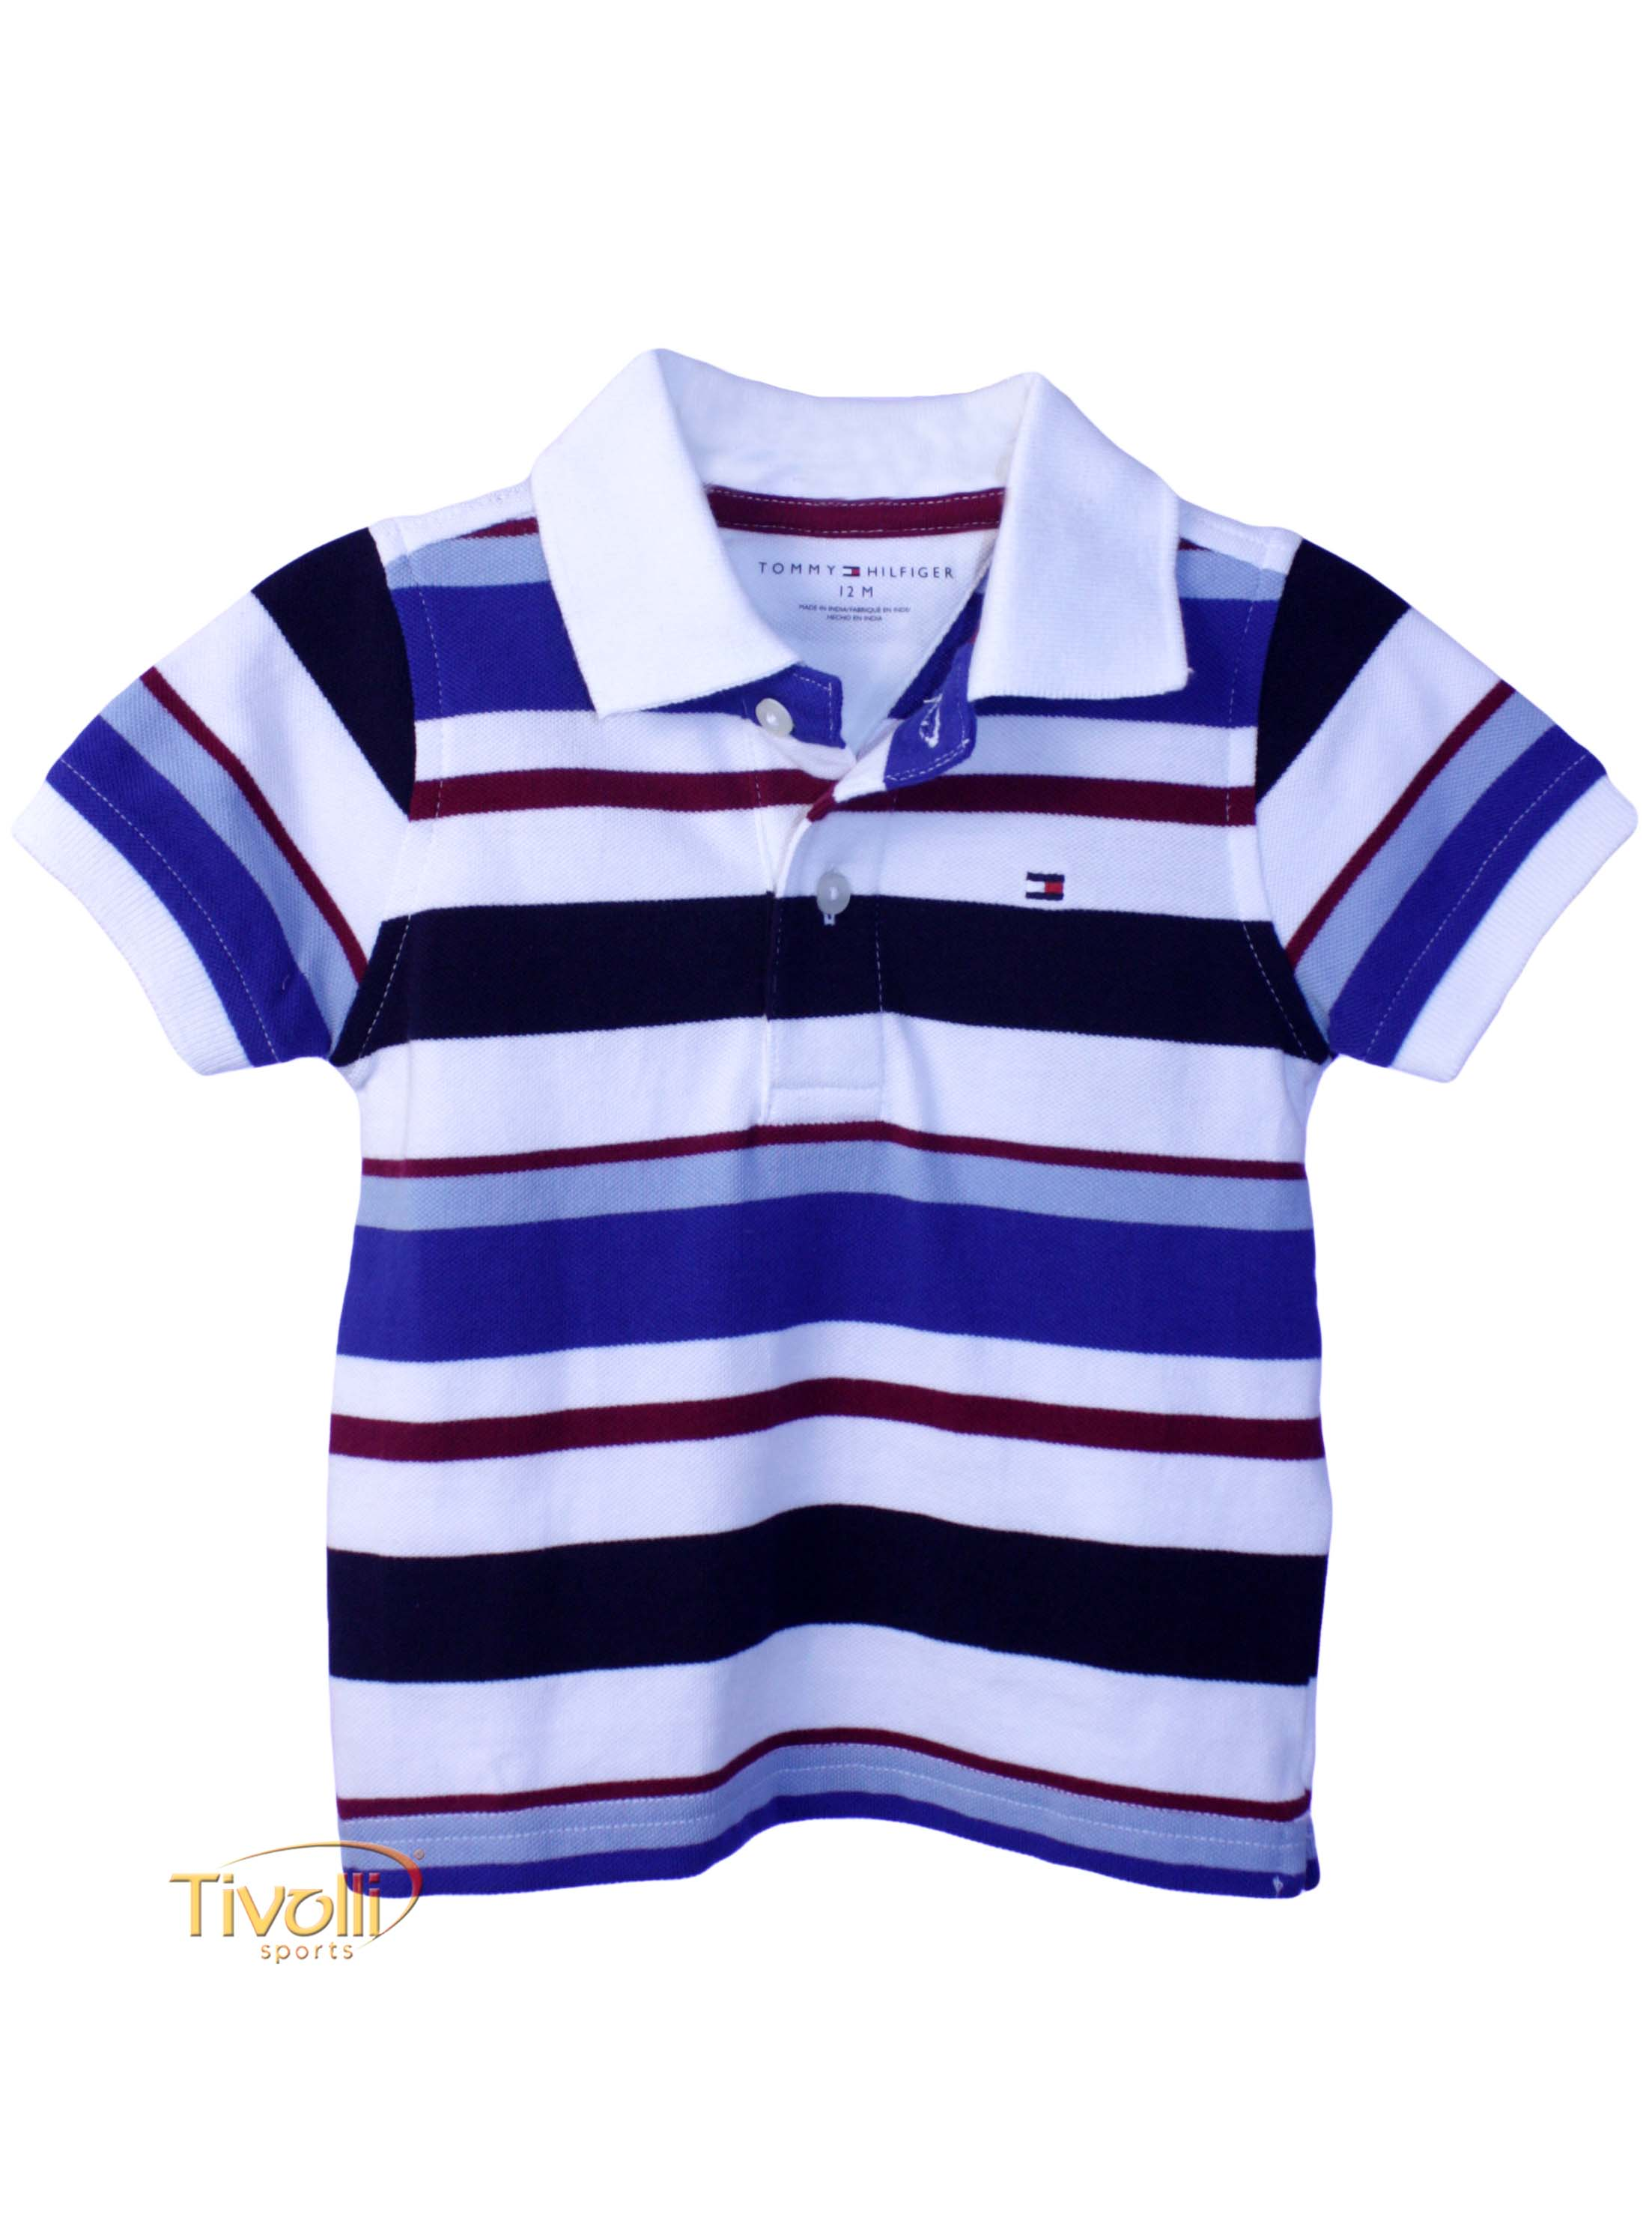 8aa0ecdd35 Polo Tommy Hilfiger Leo Infantil   Listrada branca